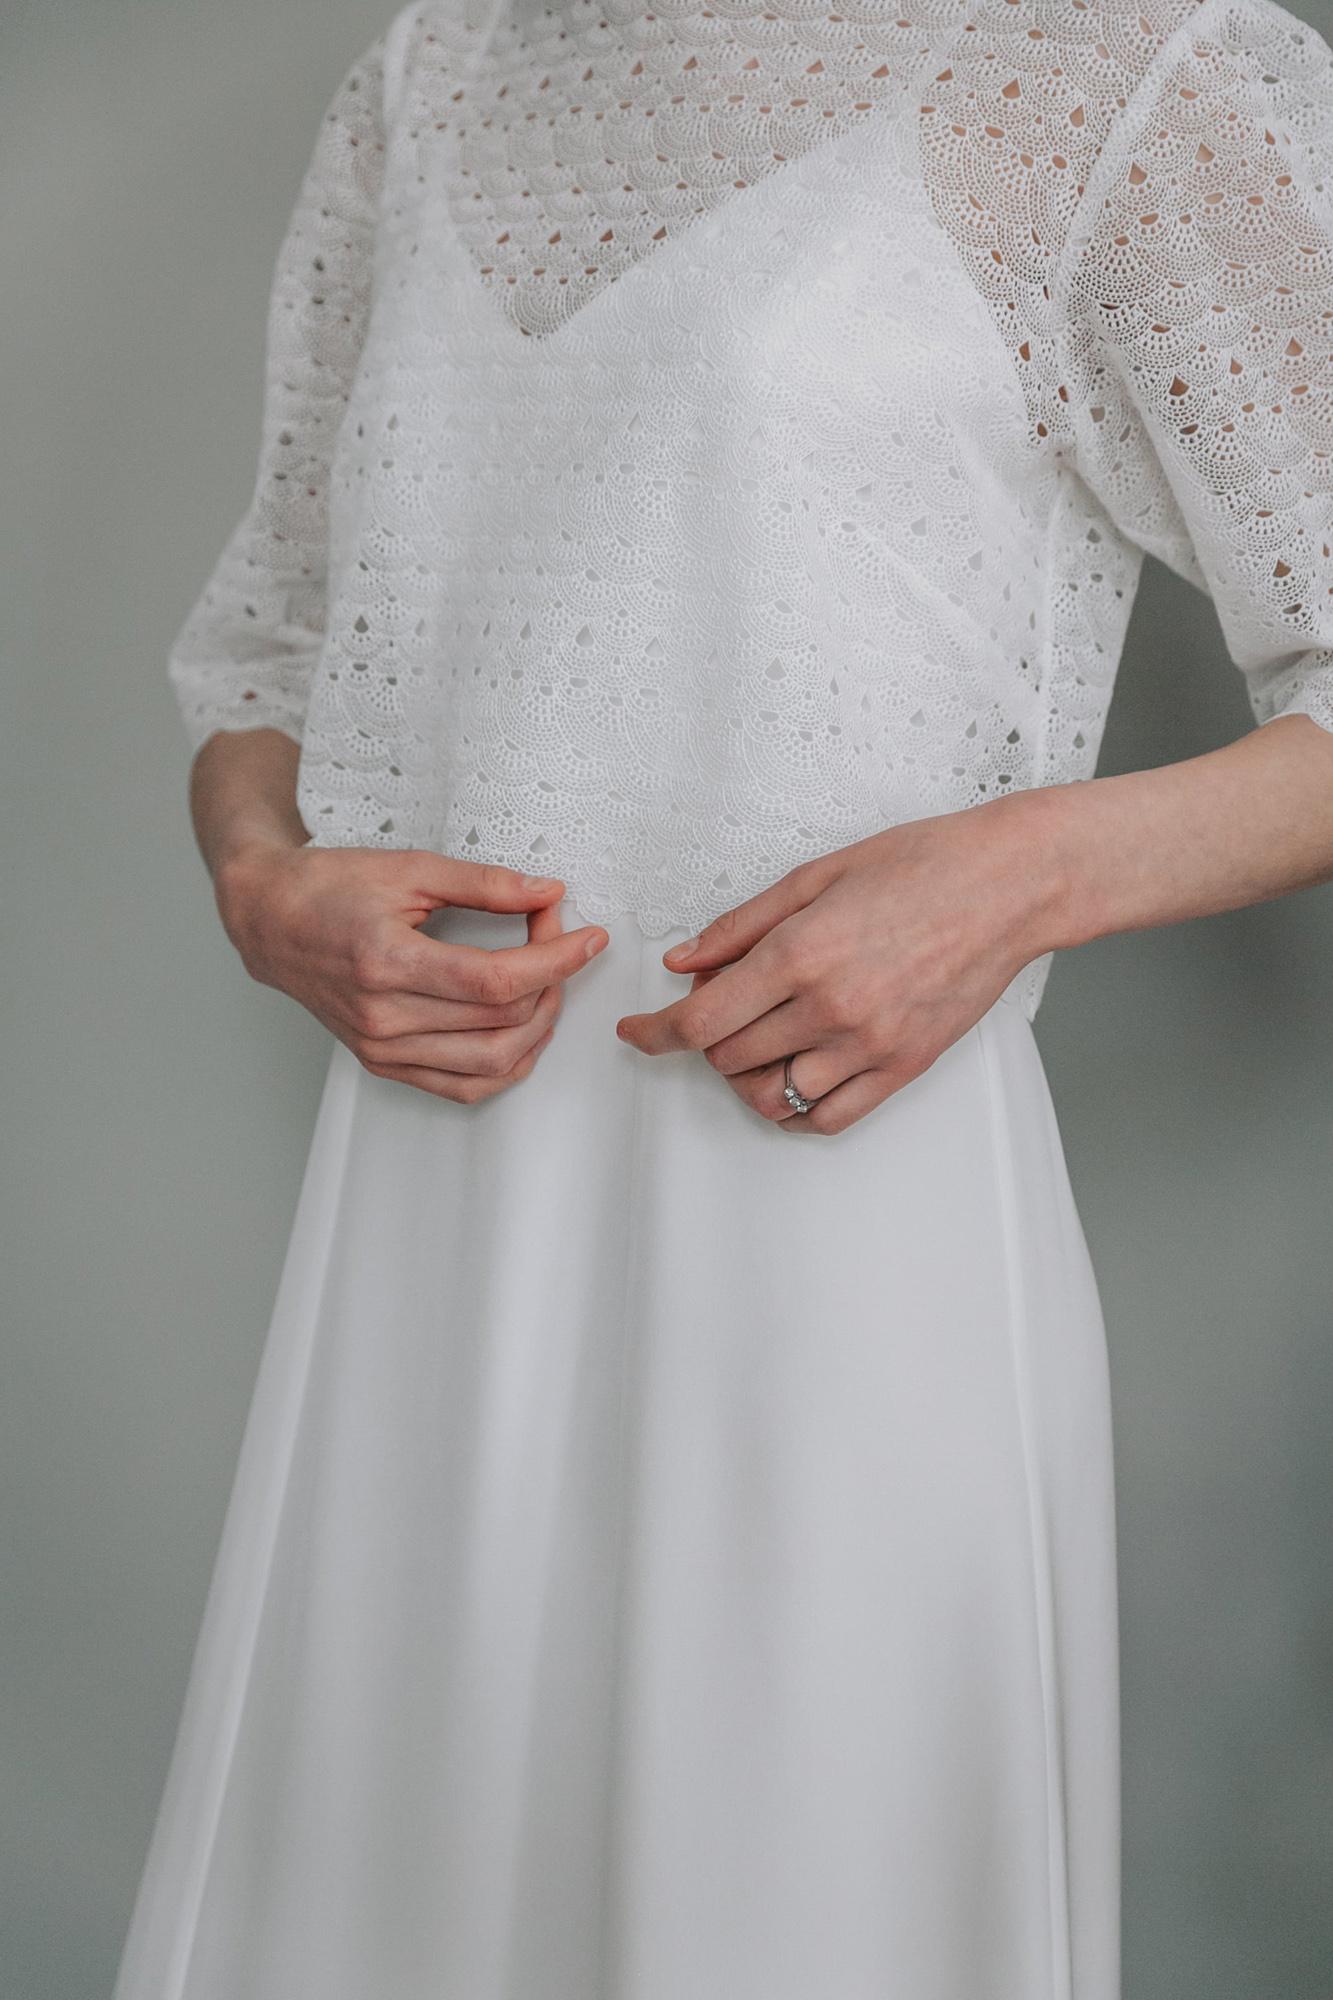 Kate-Beaumont-Sheffield-Freesia-Guipure-Lace-Jacket-Snowdrop-Minimal-Modern-Elegant-Matt-Silk-Wedding-Gown-7.jpg